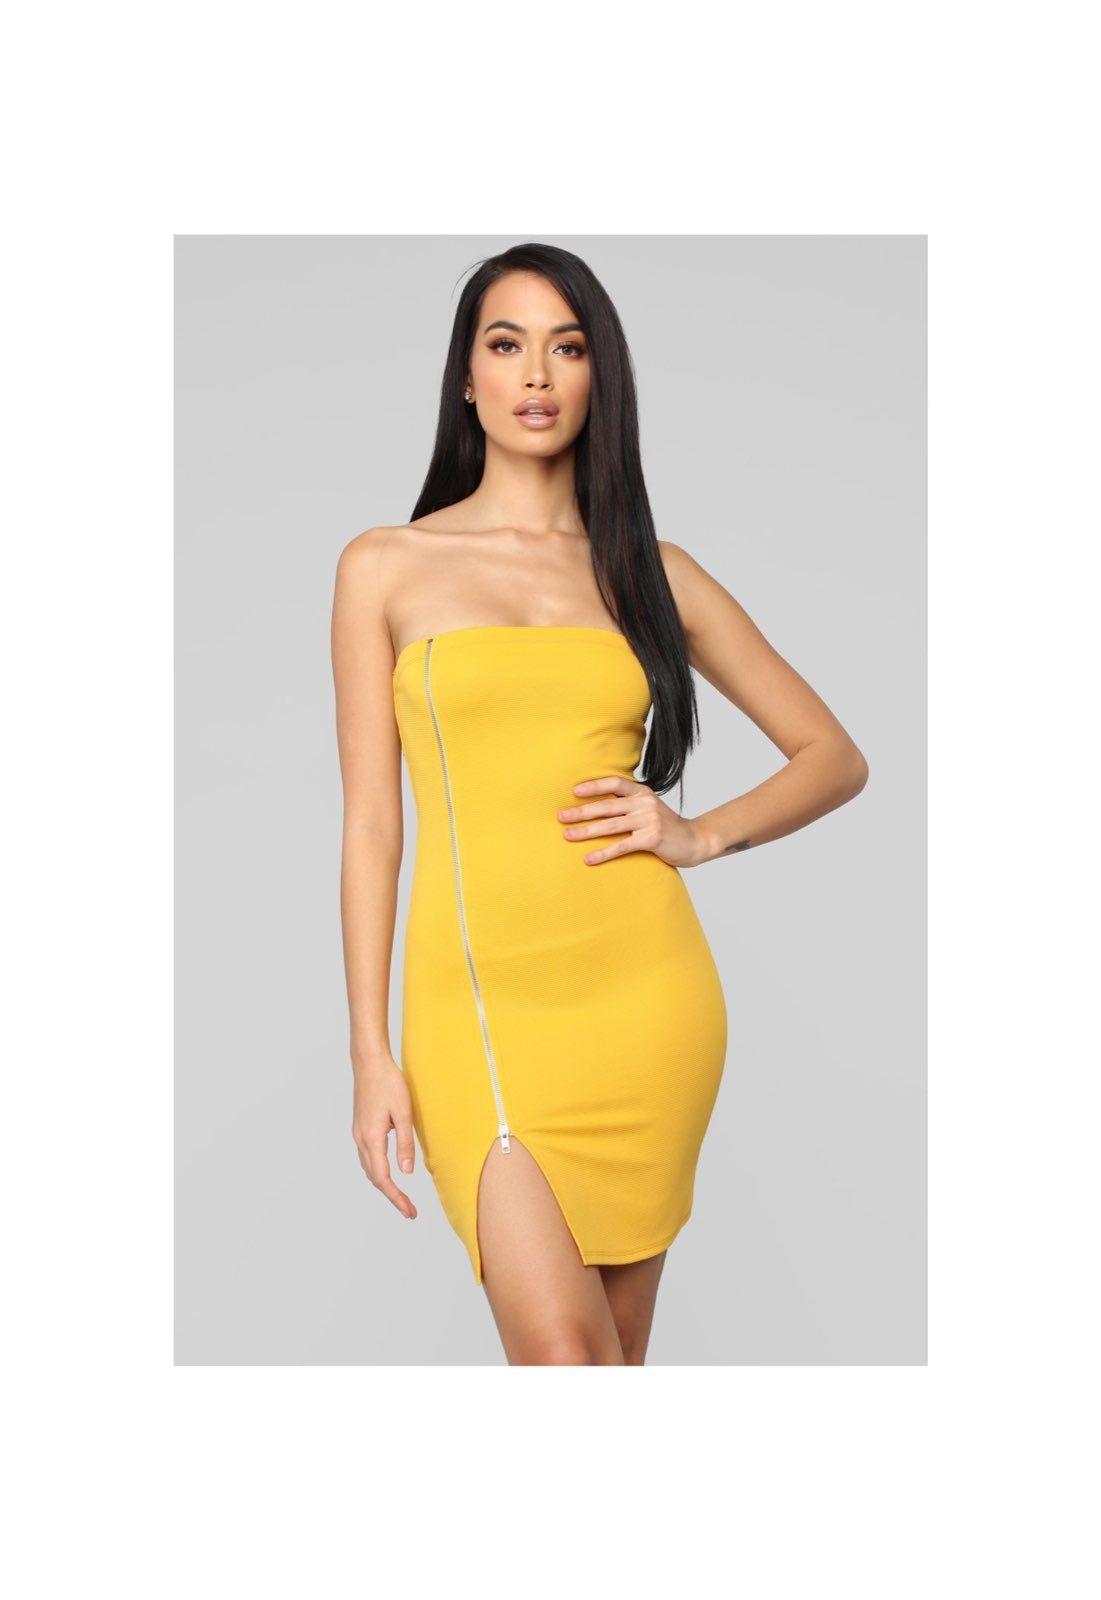 Fashion Nova Strapless Dress Really Cute Ribbed Yellow Dress With Asymmetrical Zipper Design Fits Really Nice And Form Fitting Tube Dress Fashion Mini Dress [ 1600 x 1101 Pixel ]